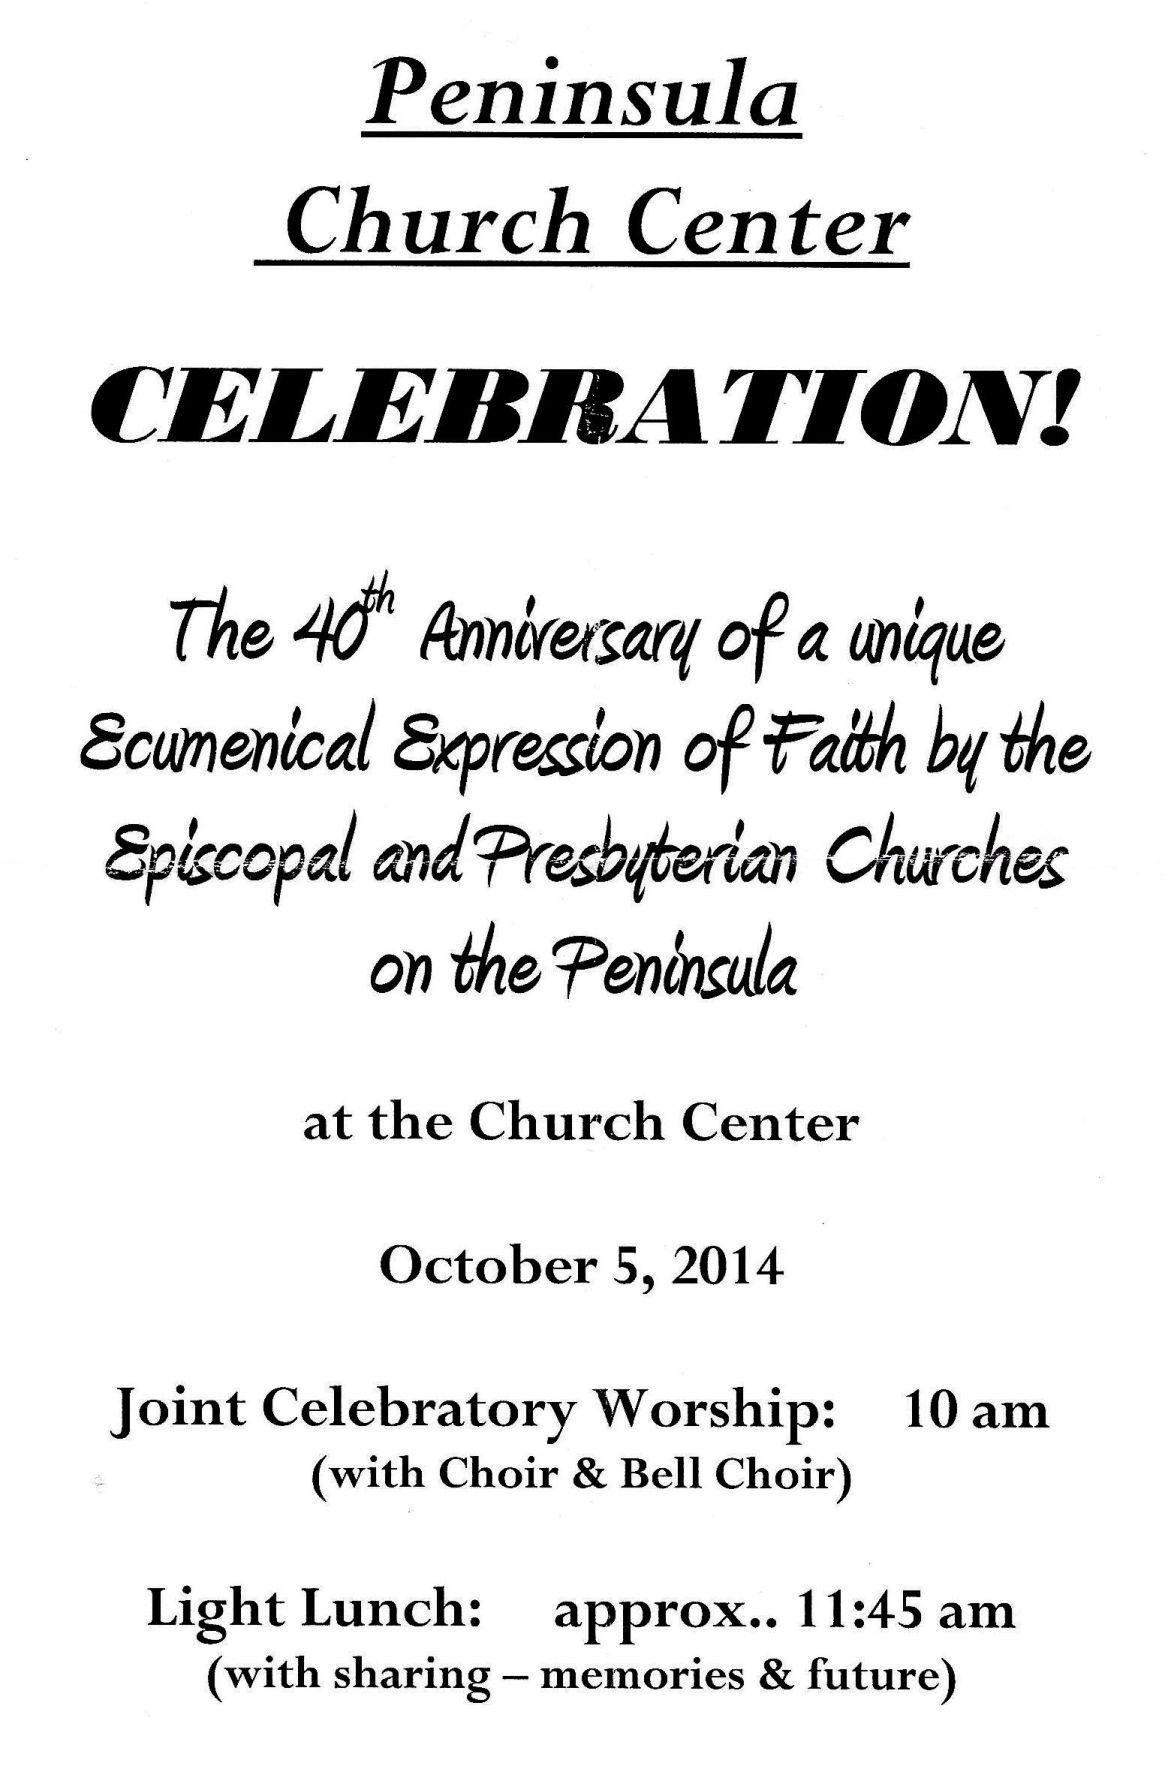 Peninsula Church Center celebrates 40 ecumenical years